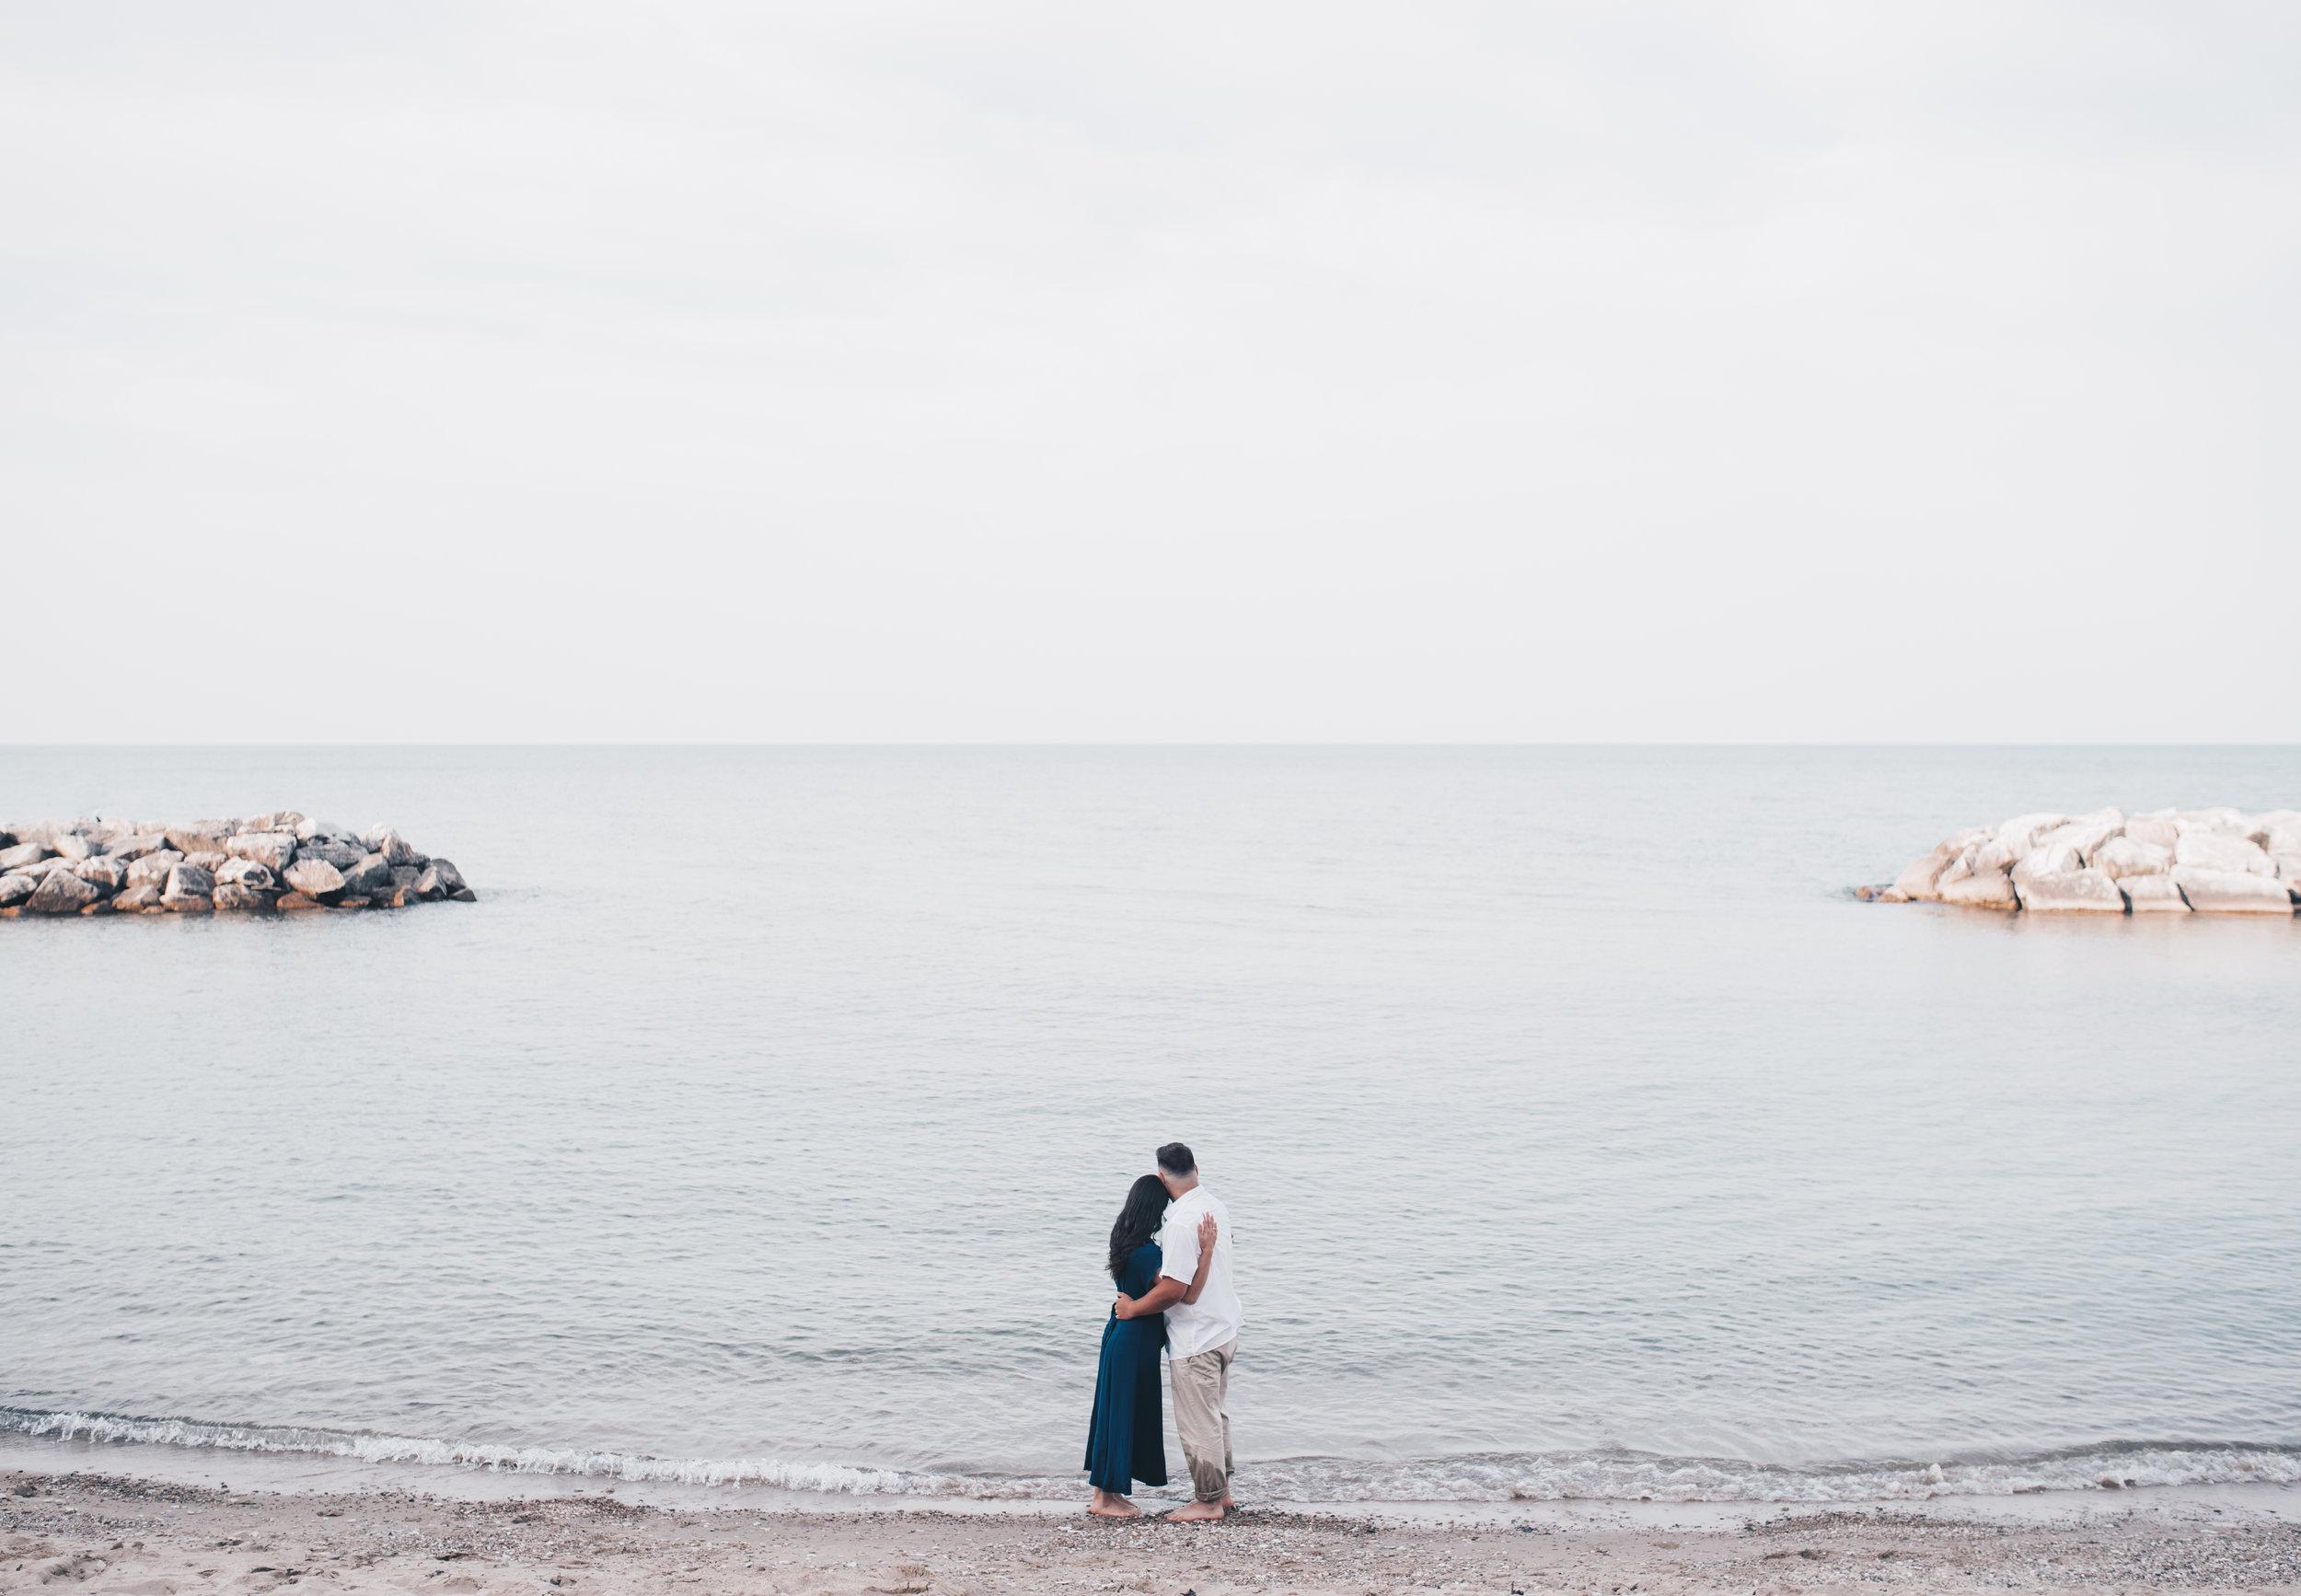 Rosewood Beach, Highland Park, Rosewood Beach Engagement, Chicago Engagement Photographer, Chicago Beach Engagement